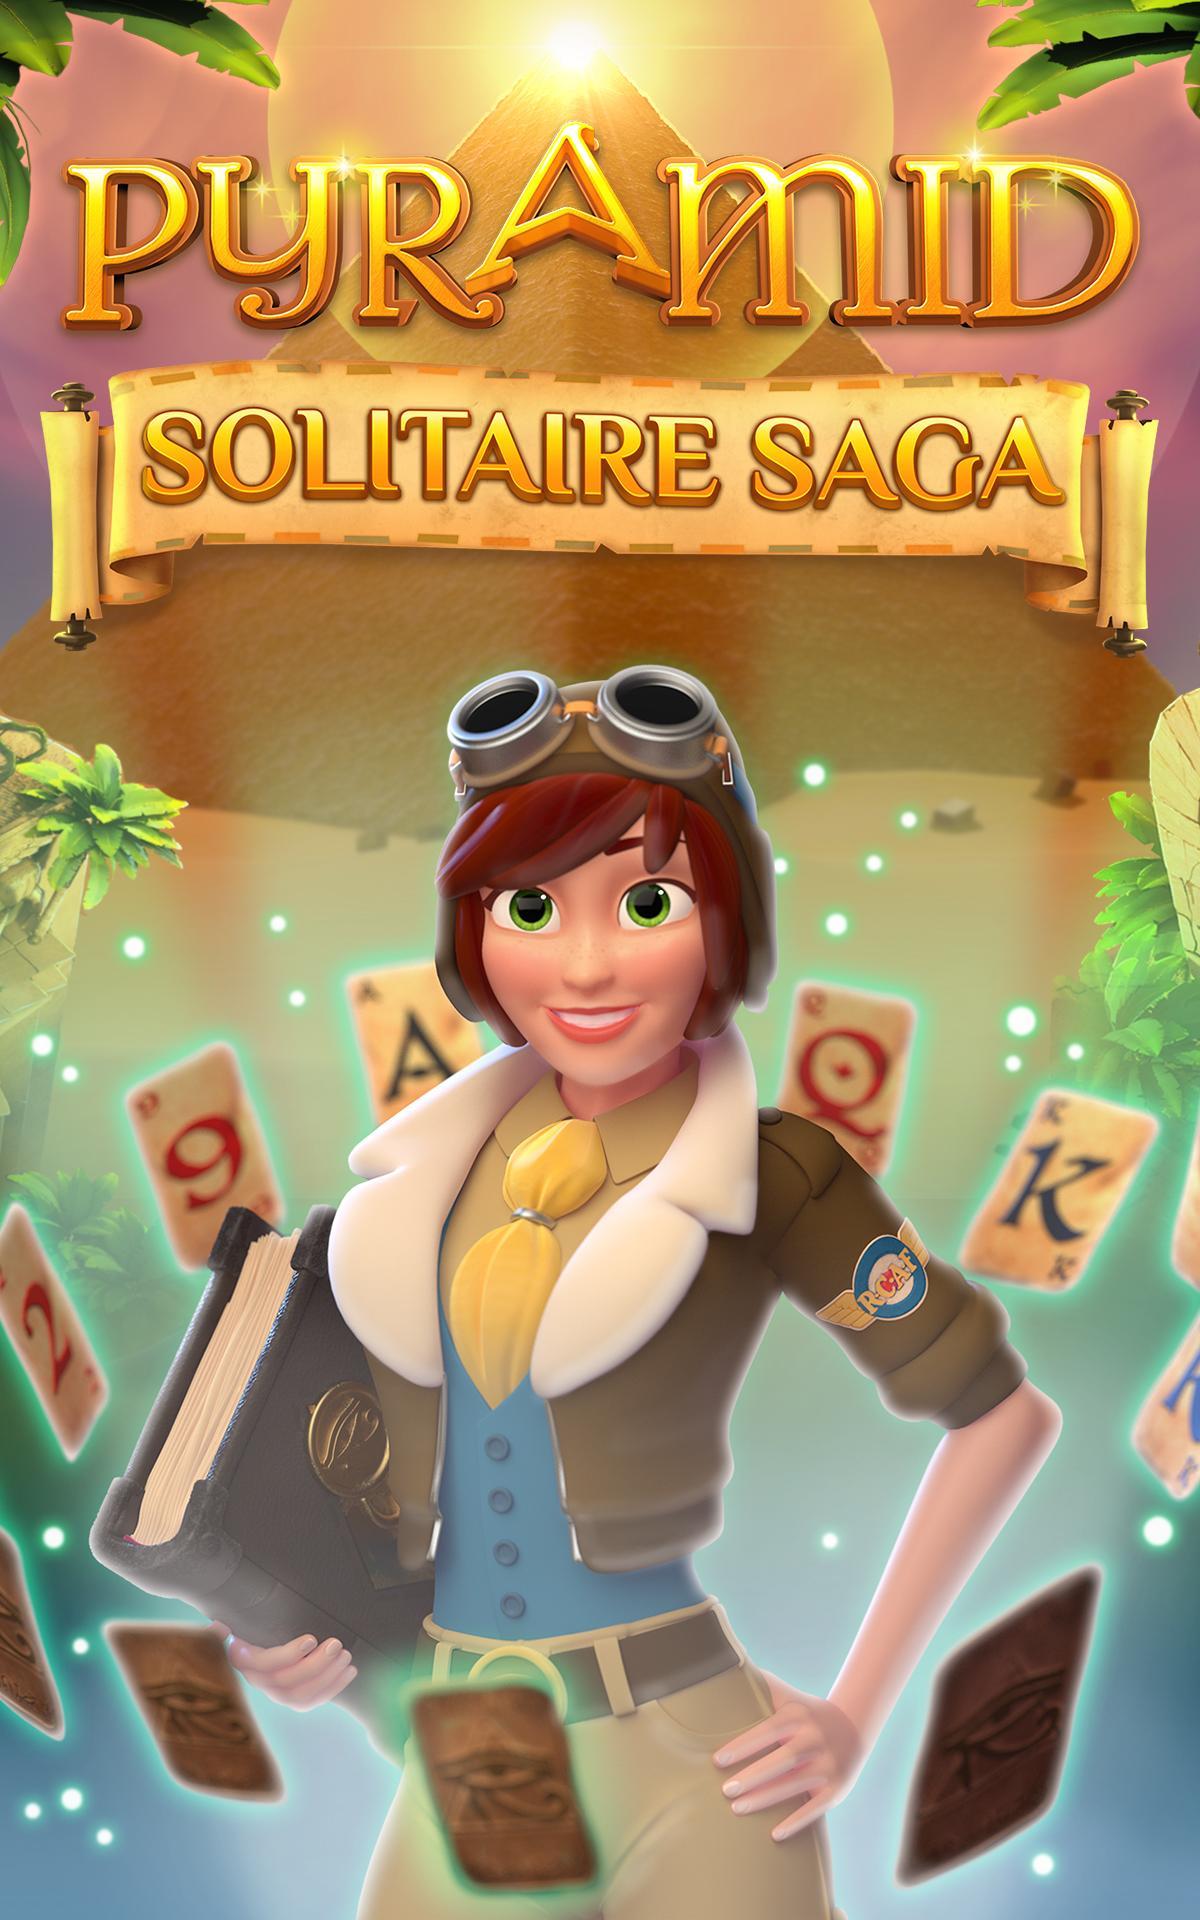 Pyramid Solitaire Saga screenshot #18